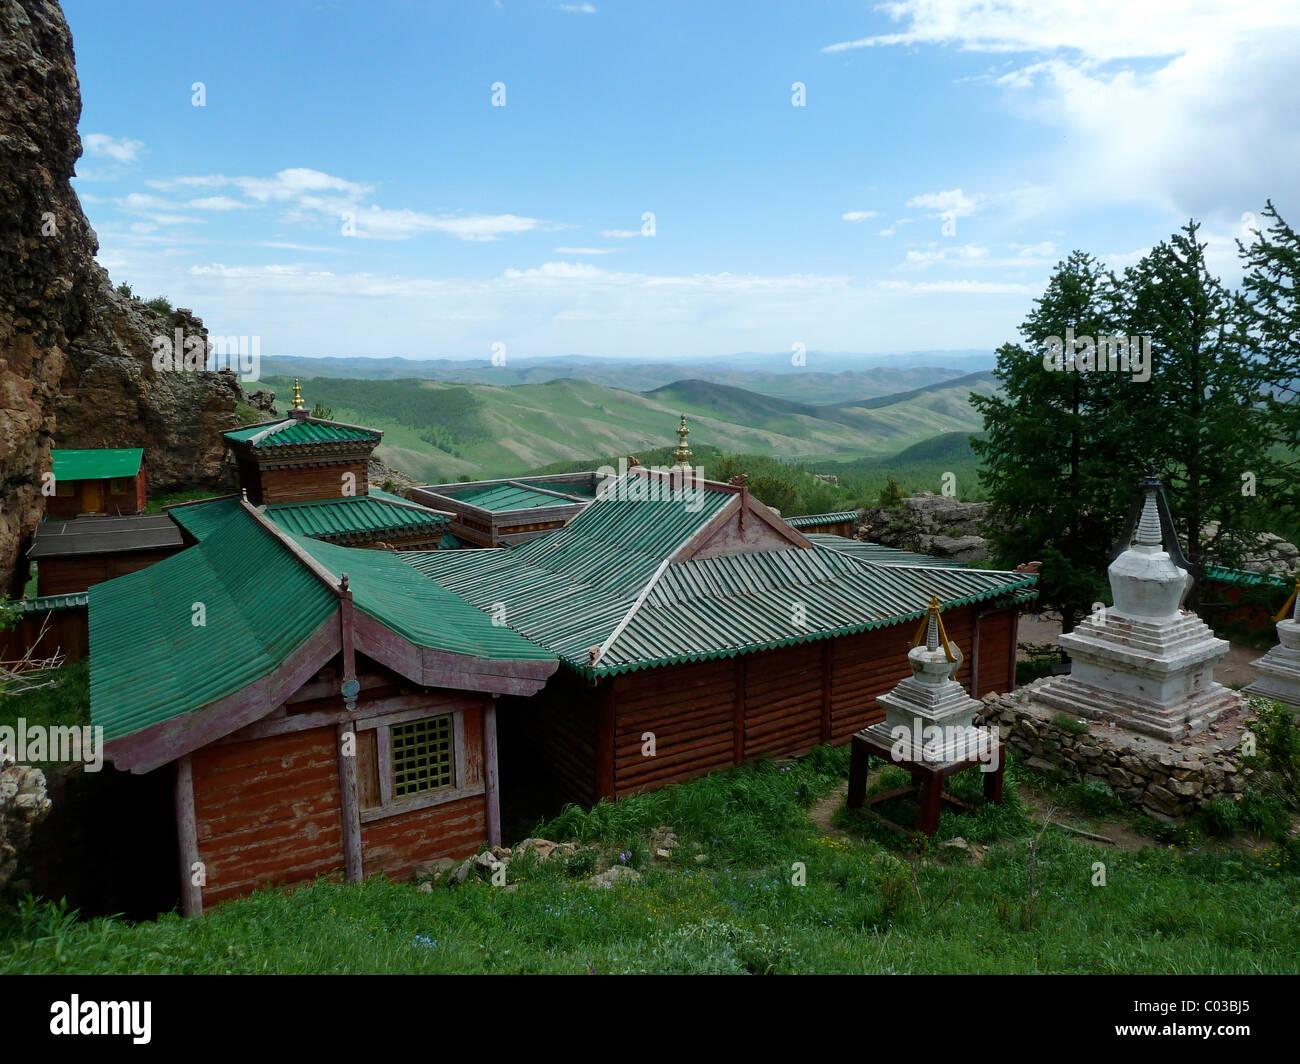 Buddhist monastery in the mountains of Khangai Nuruu National Park, Toevkhoen Khiid, Orkhon Khuerkhree, Kharkhorin - Stock Image